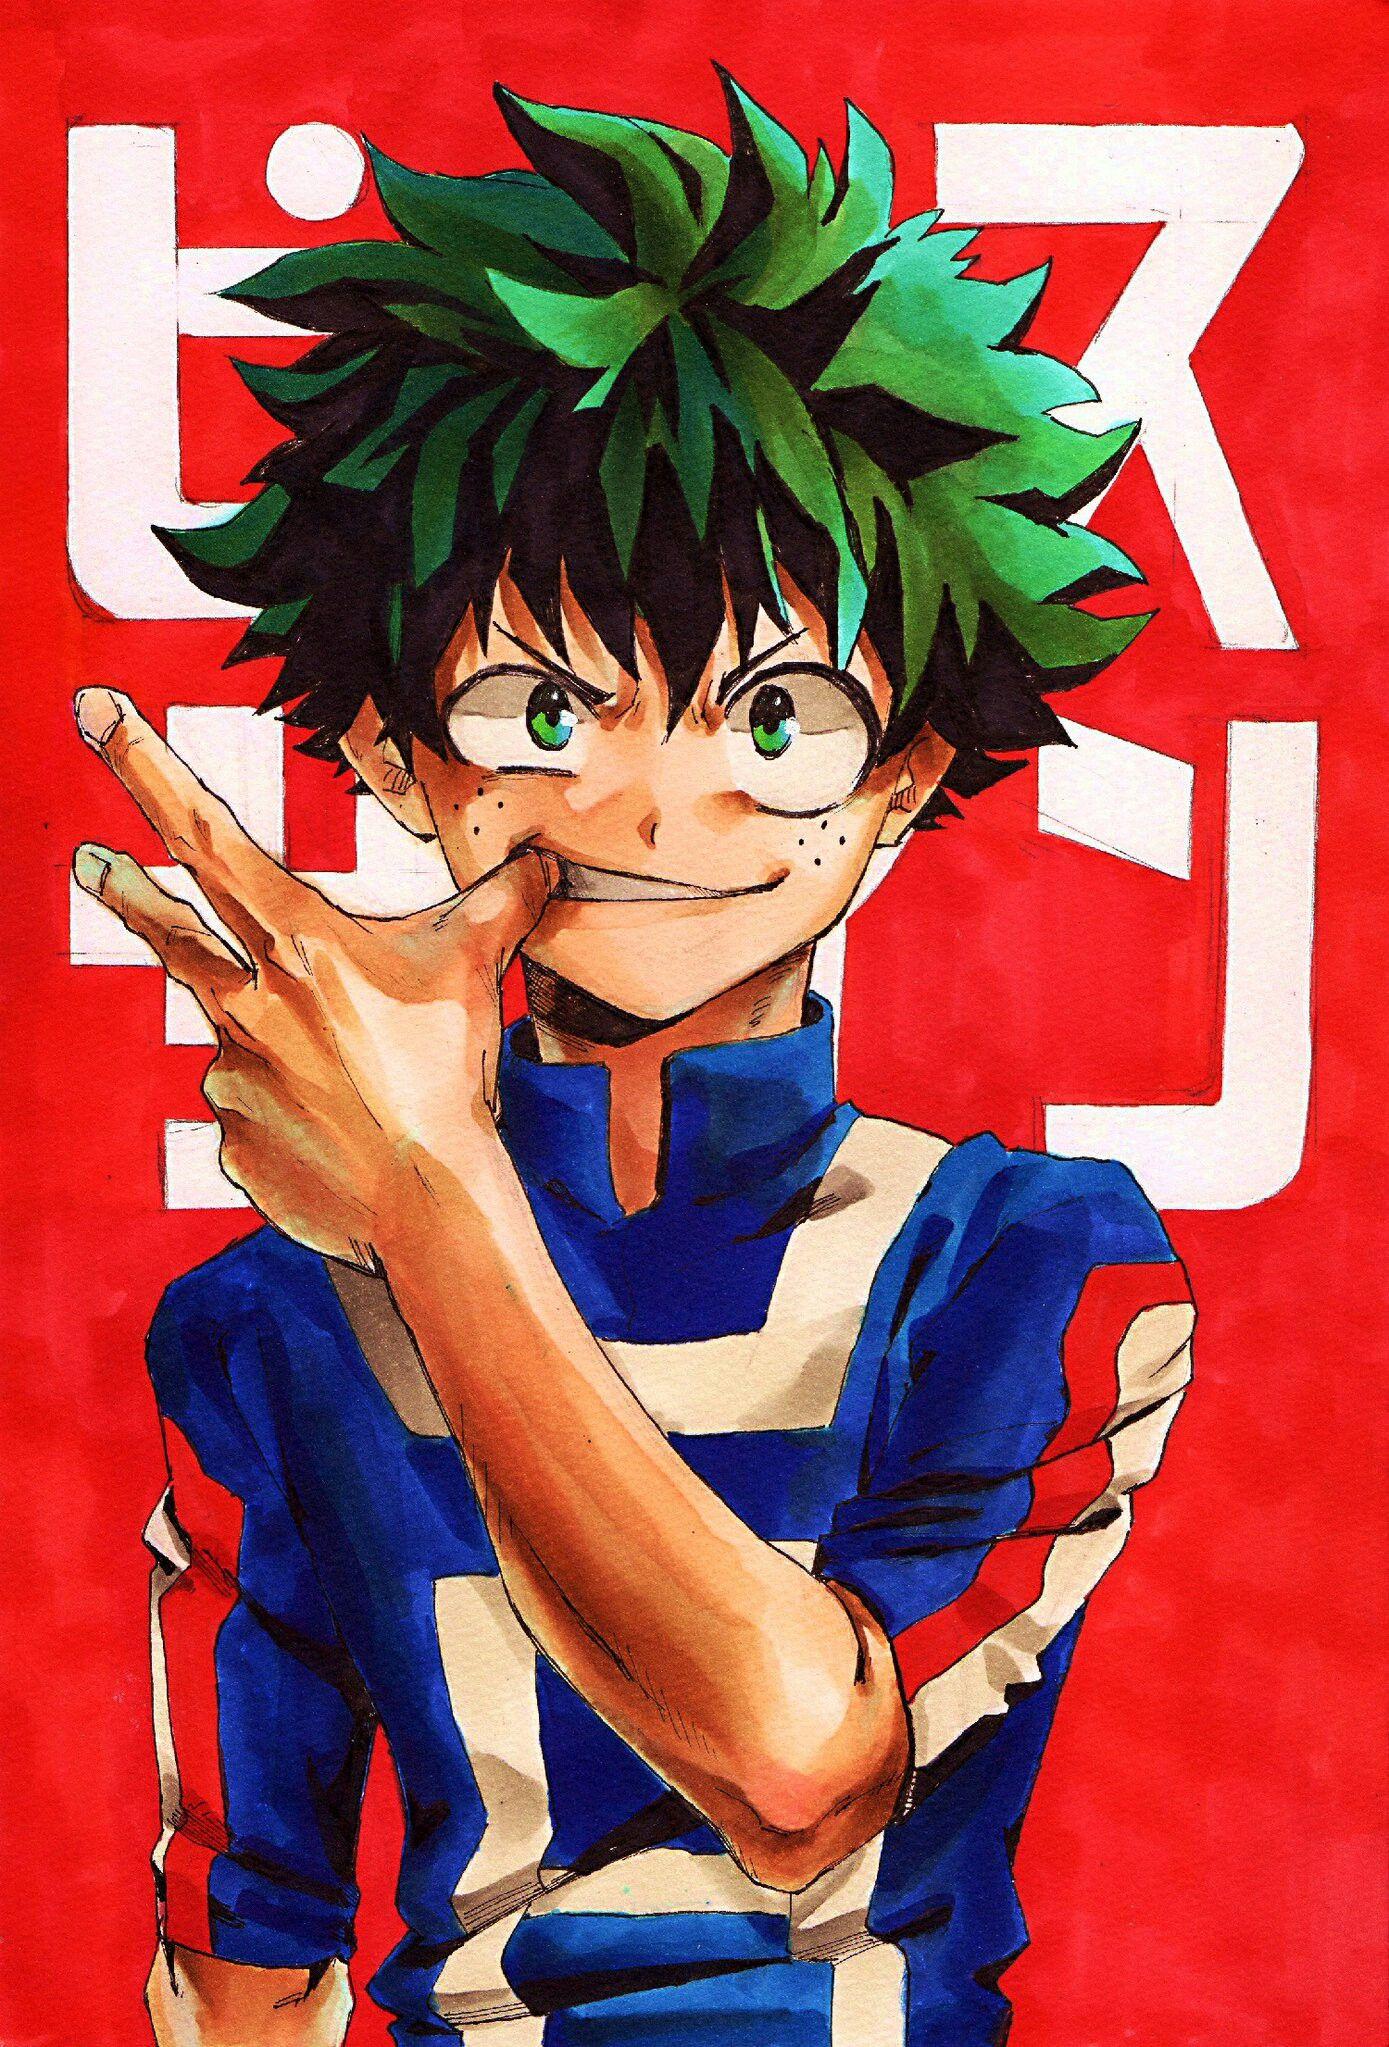 Boku no Hero Academia Midoriya Izuku, My hero academia